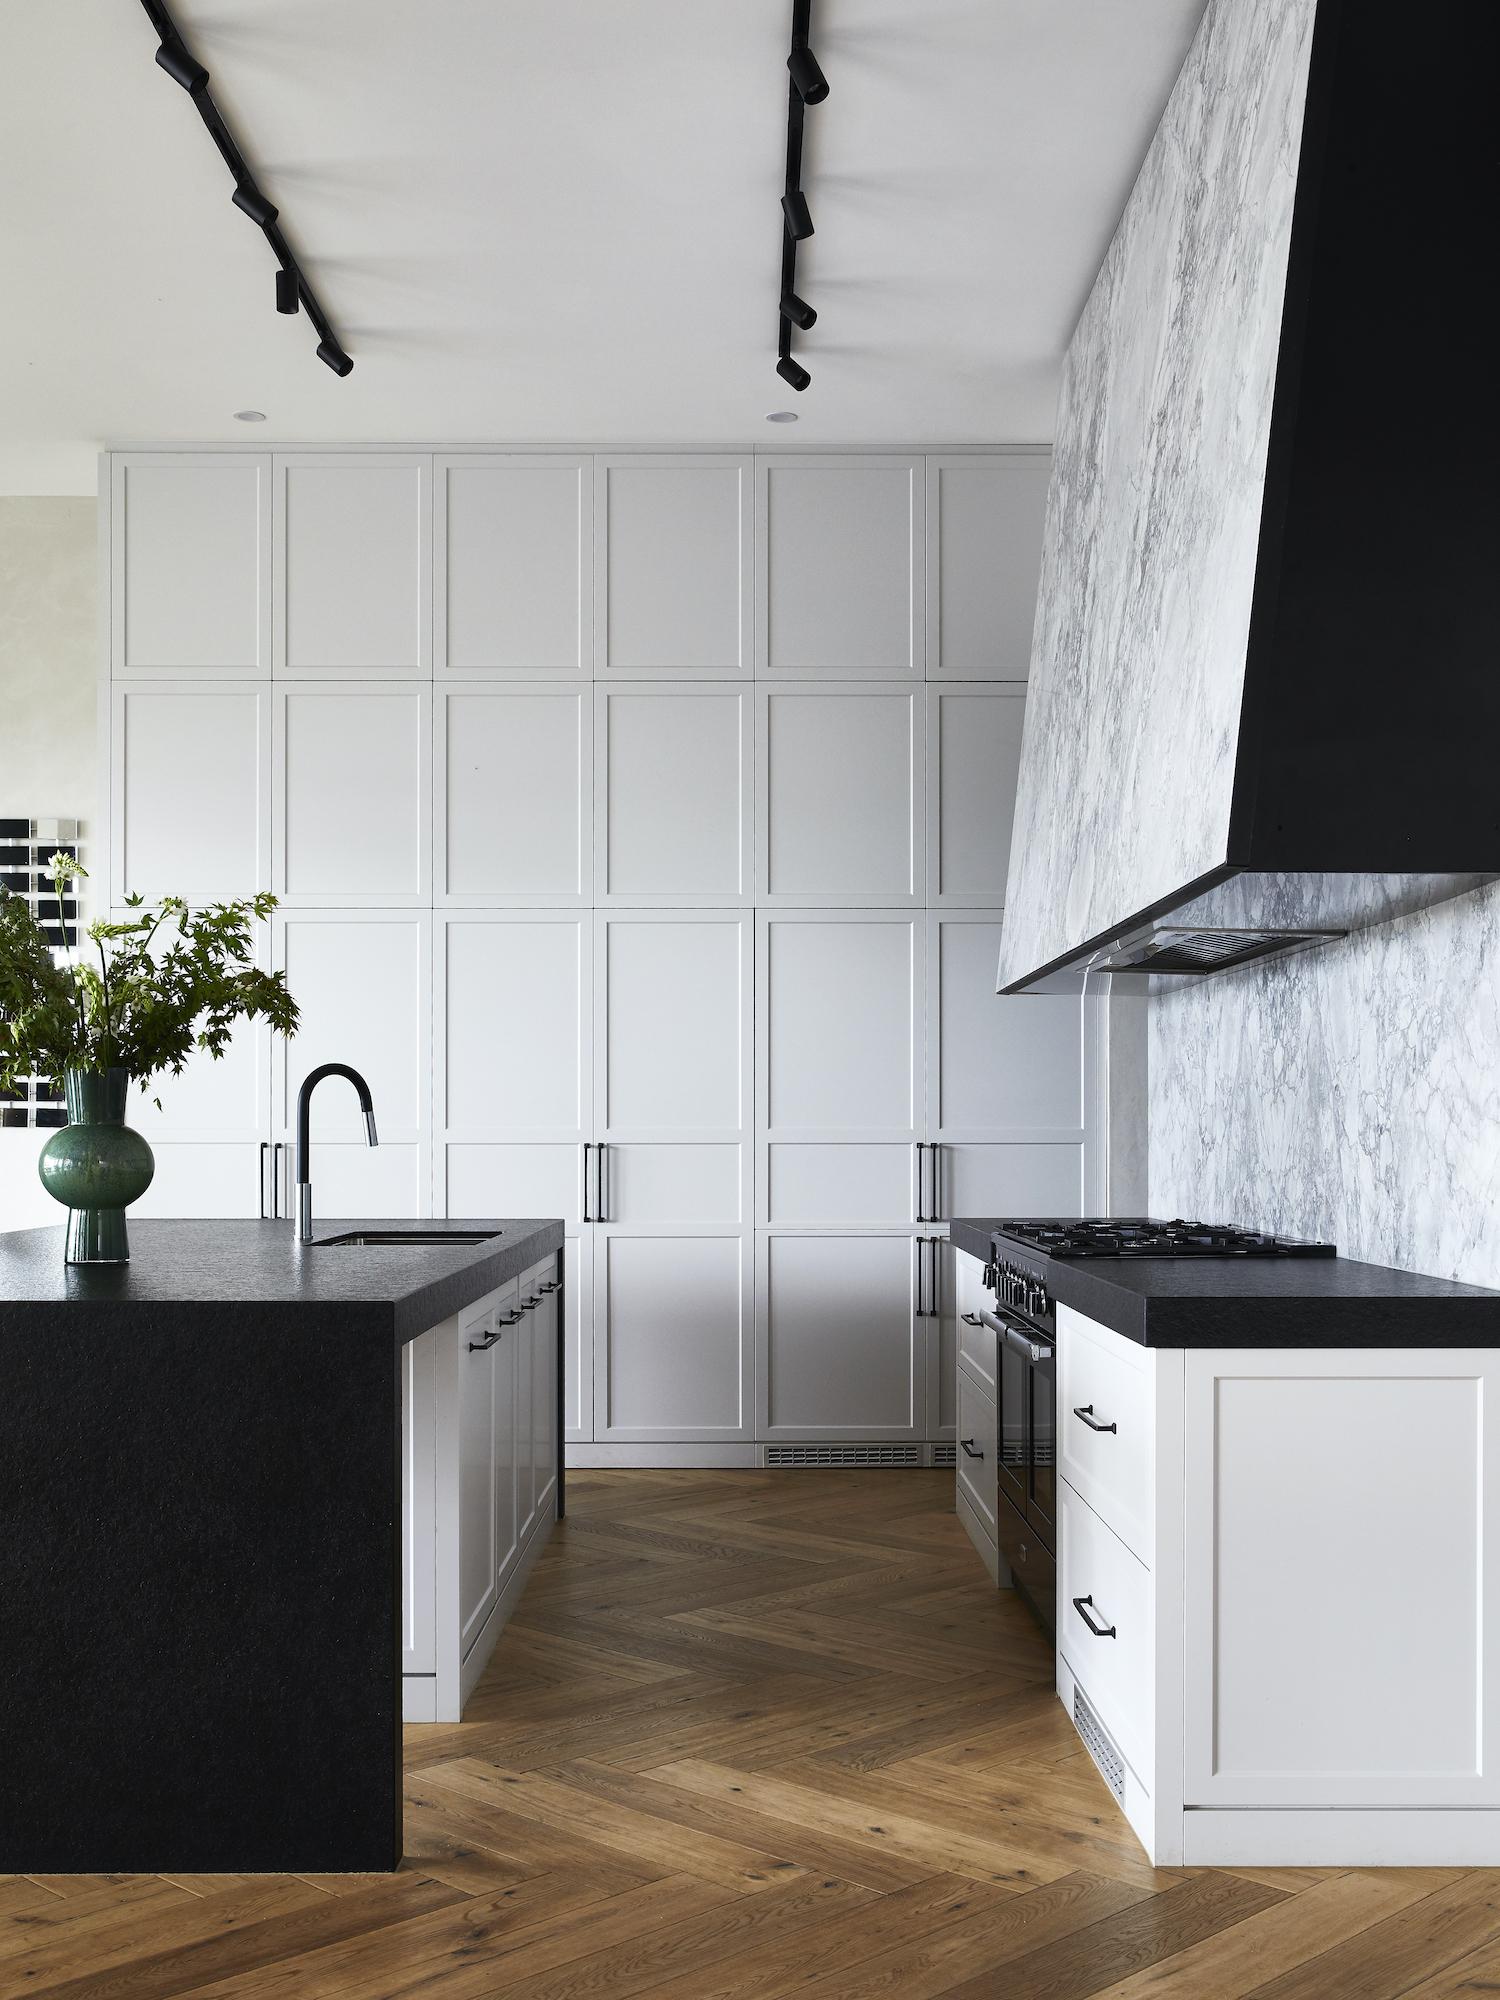 est living kitchen closeup kew house kate walker design 4